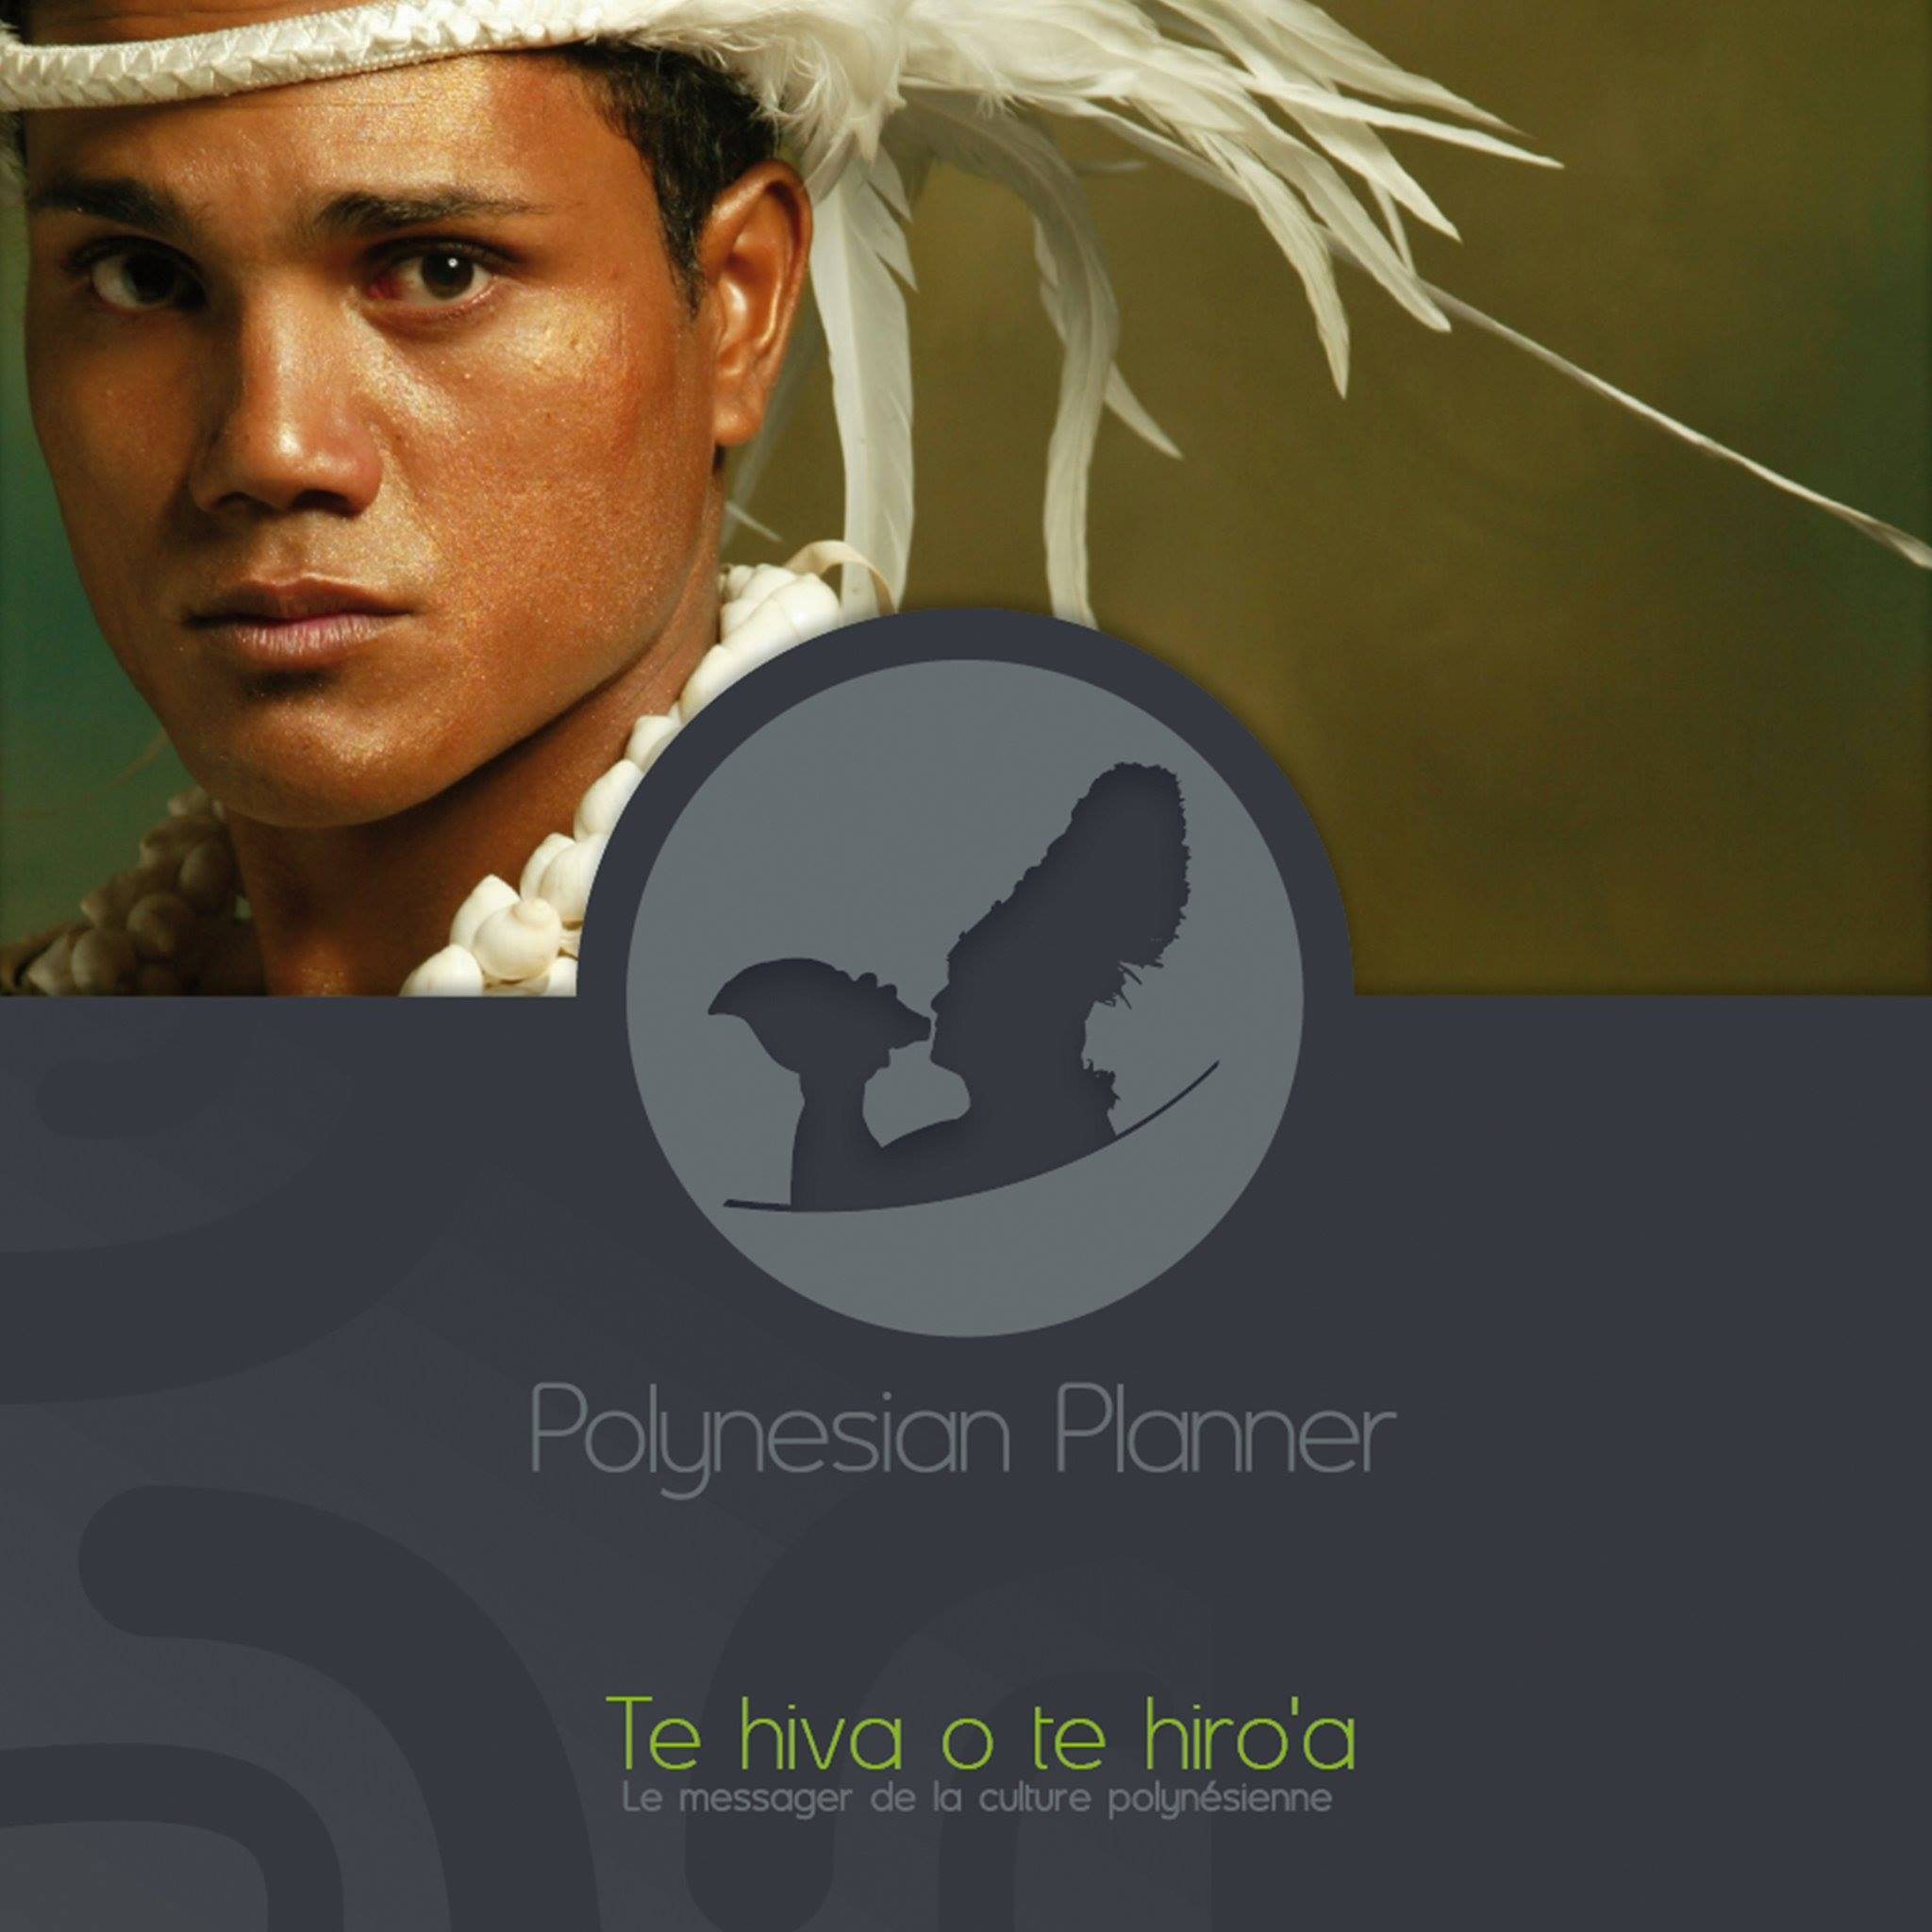 https://tahititourisme.it/wp-content/uploads/2017/08/polynesianplannerphotodeprofil.jpg